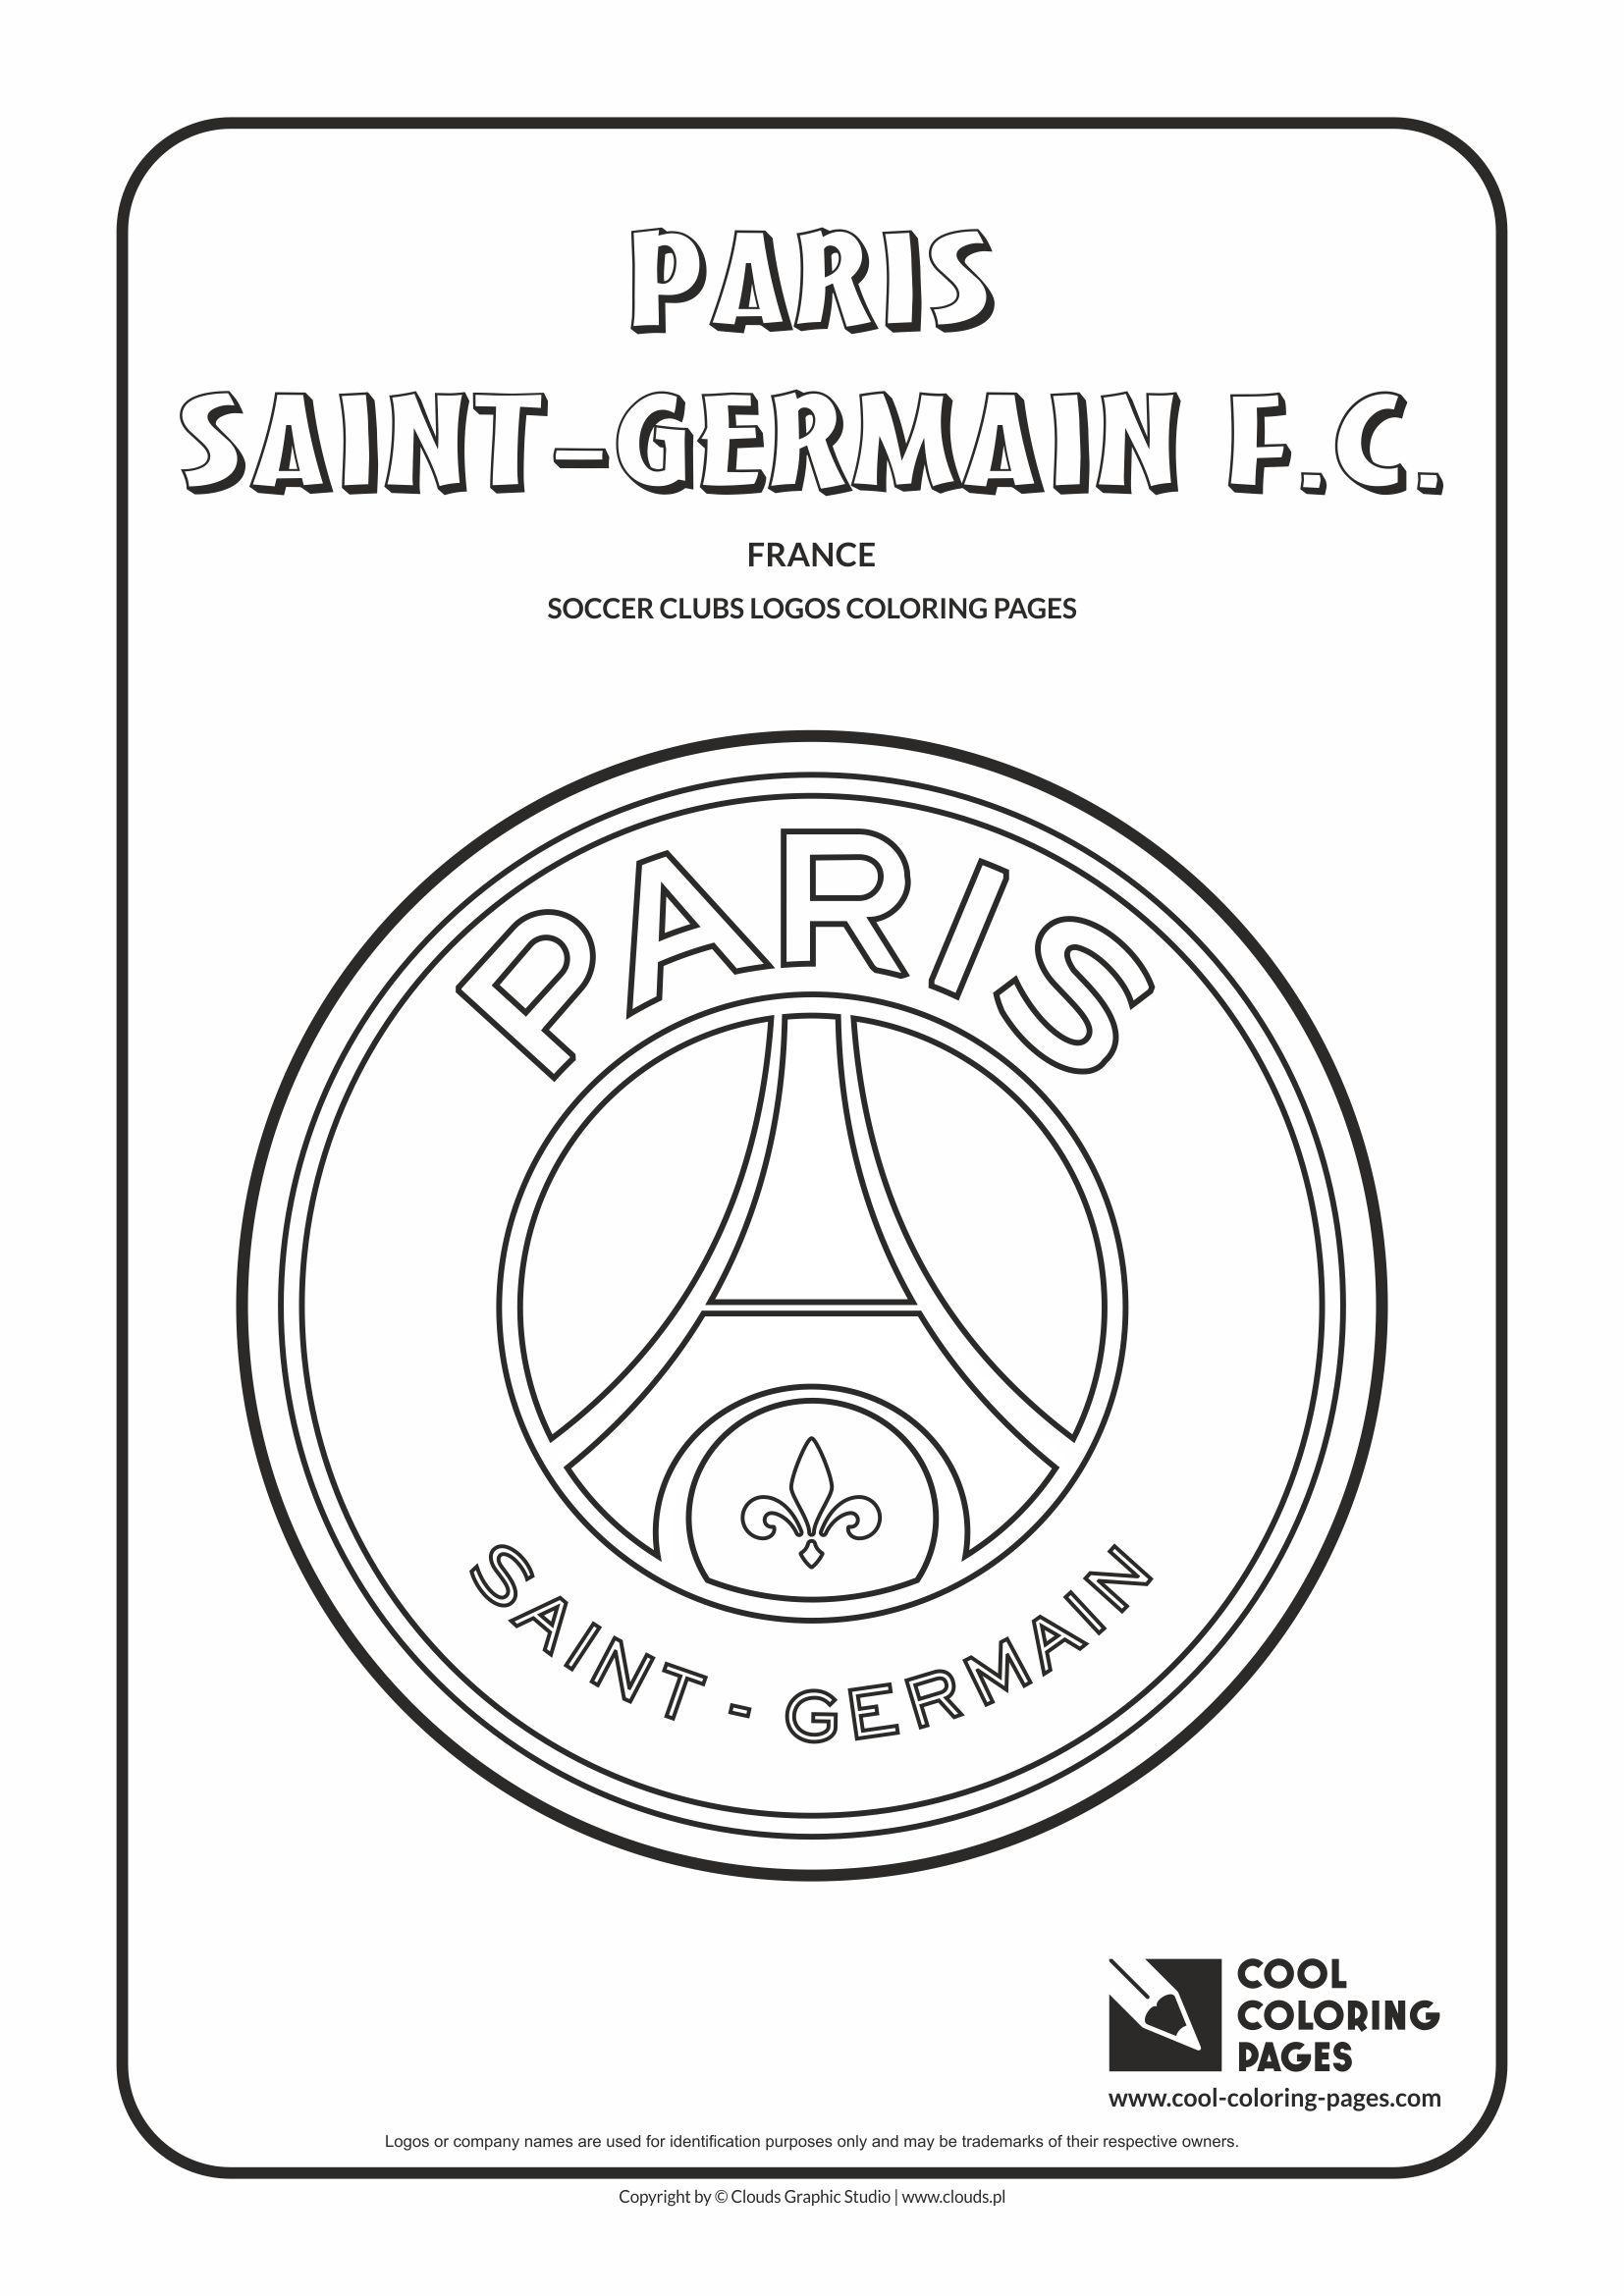 Cool Coloring Pages Soccer Clubs Logos Paris Saint Germain